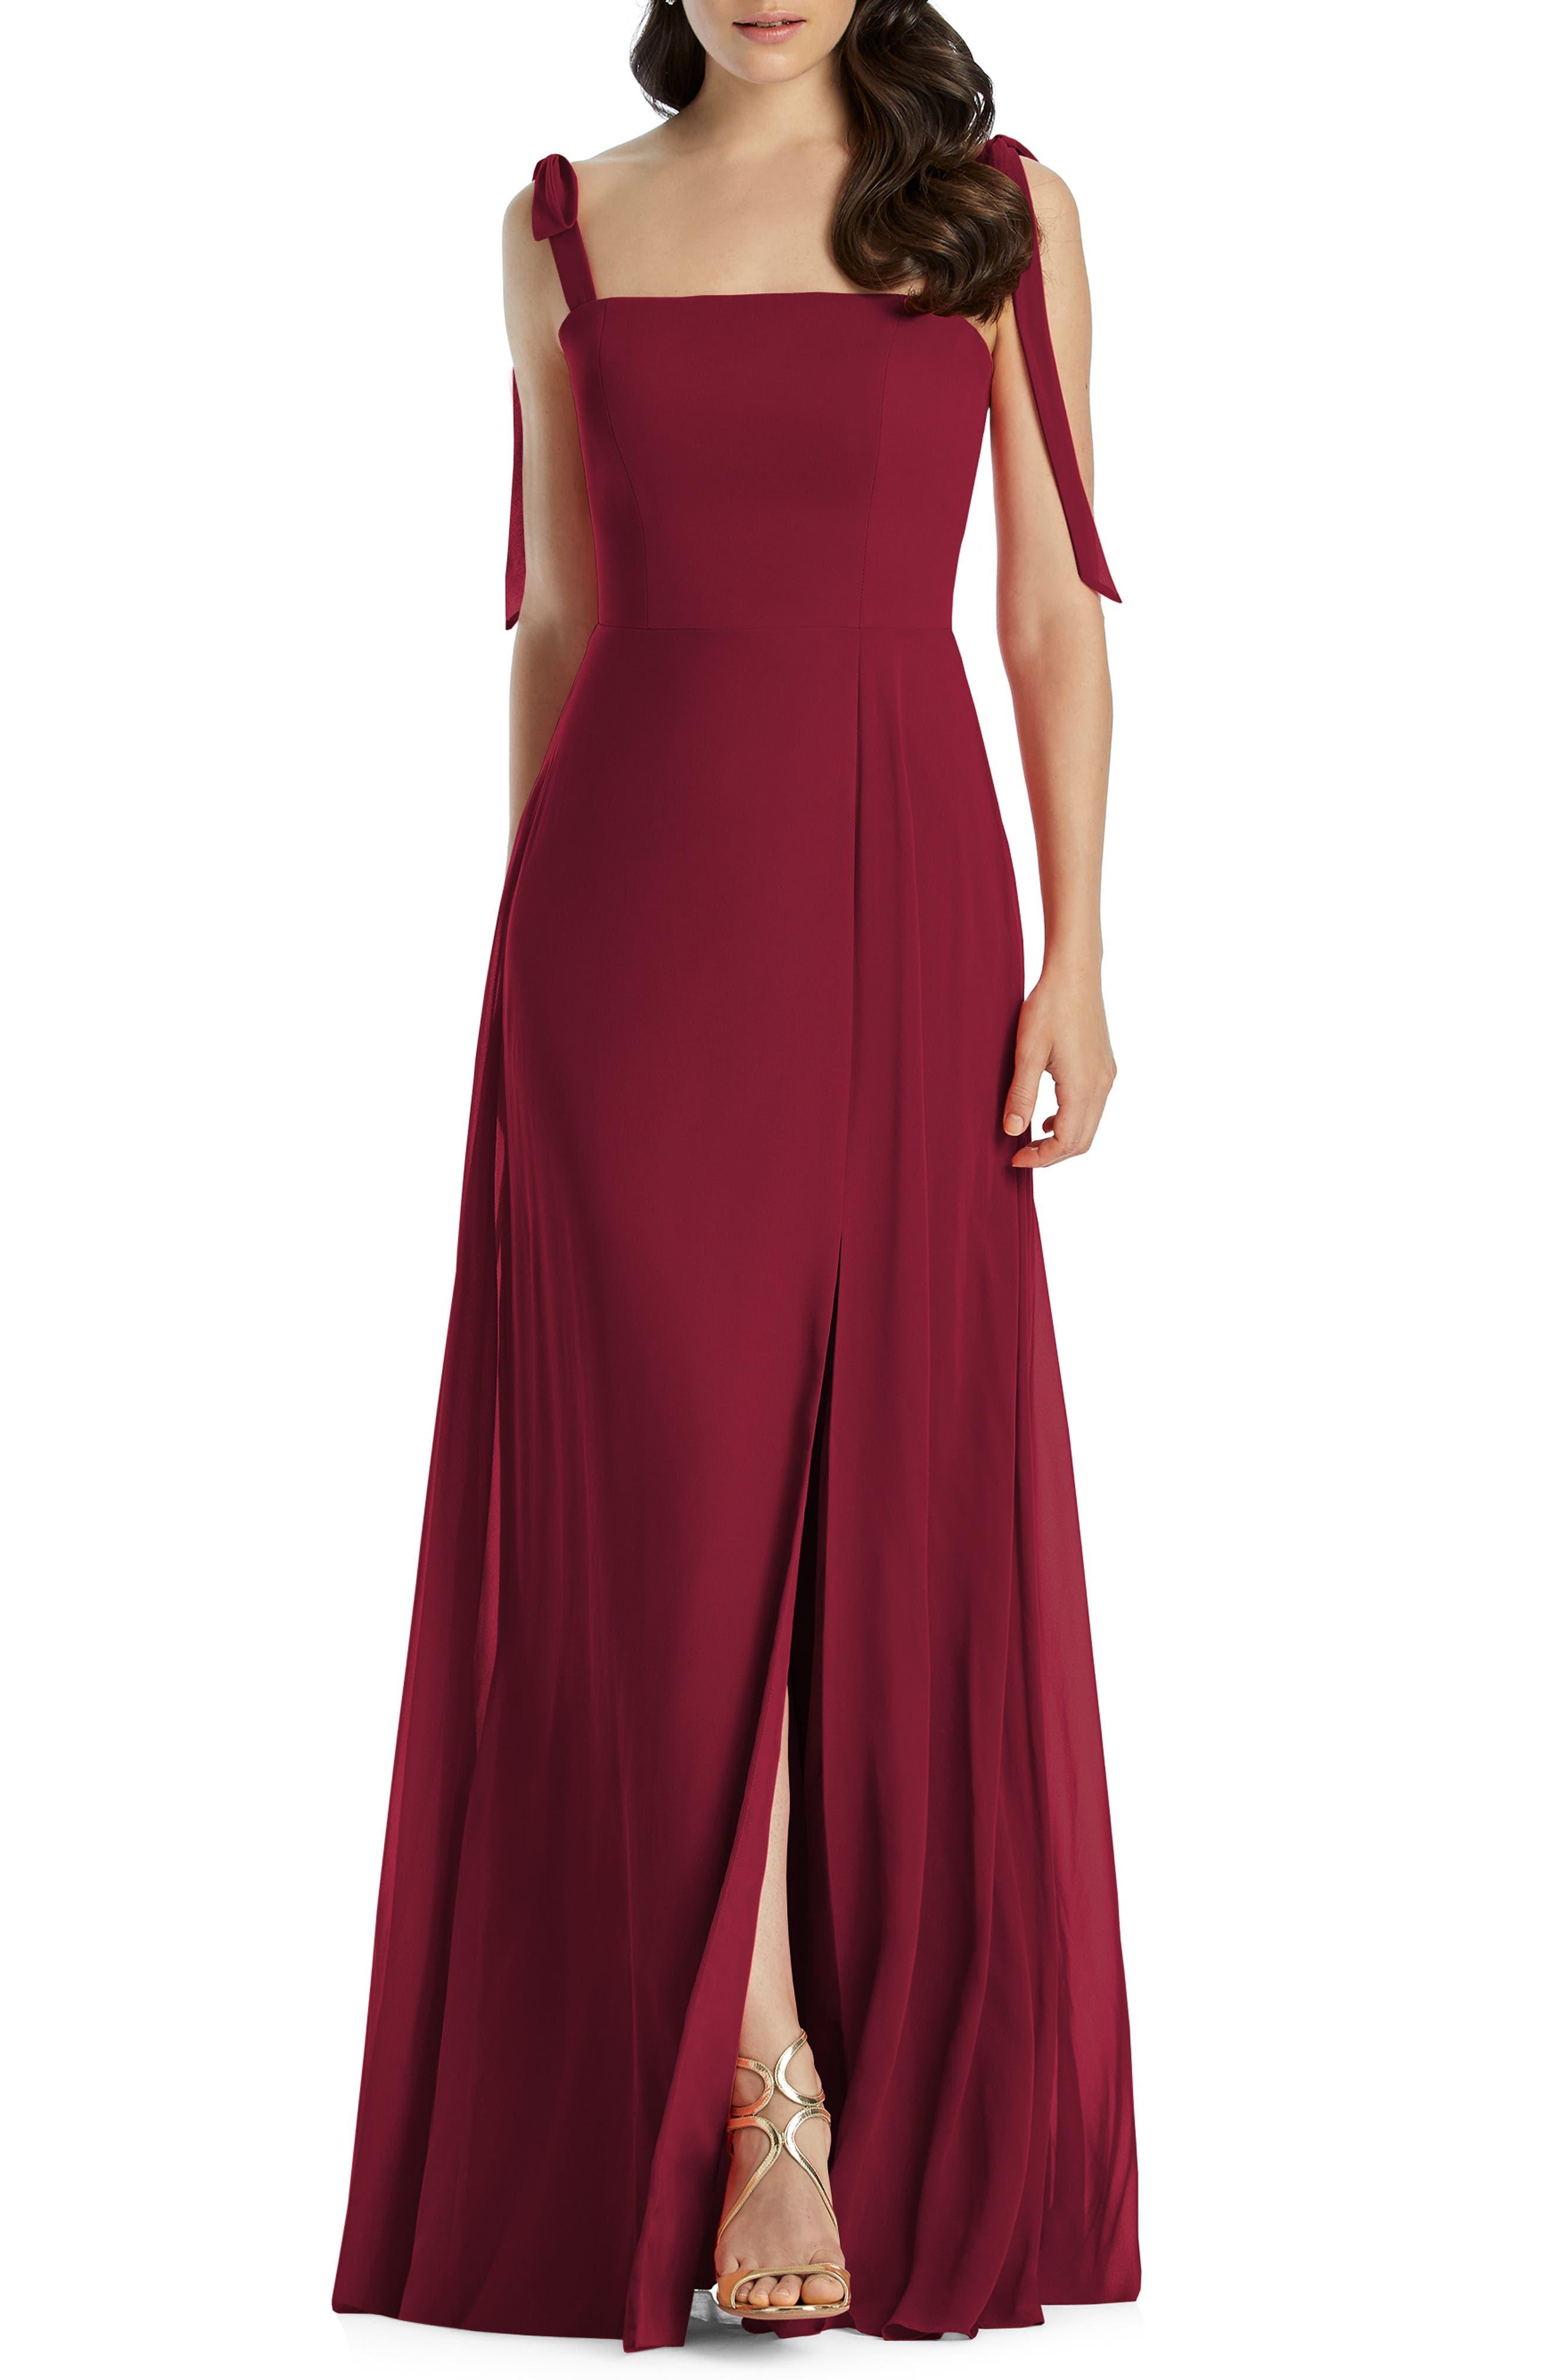 Dessy Collection Shoulder Tie Chiffon Evening Dress